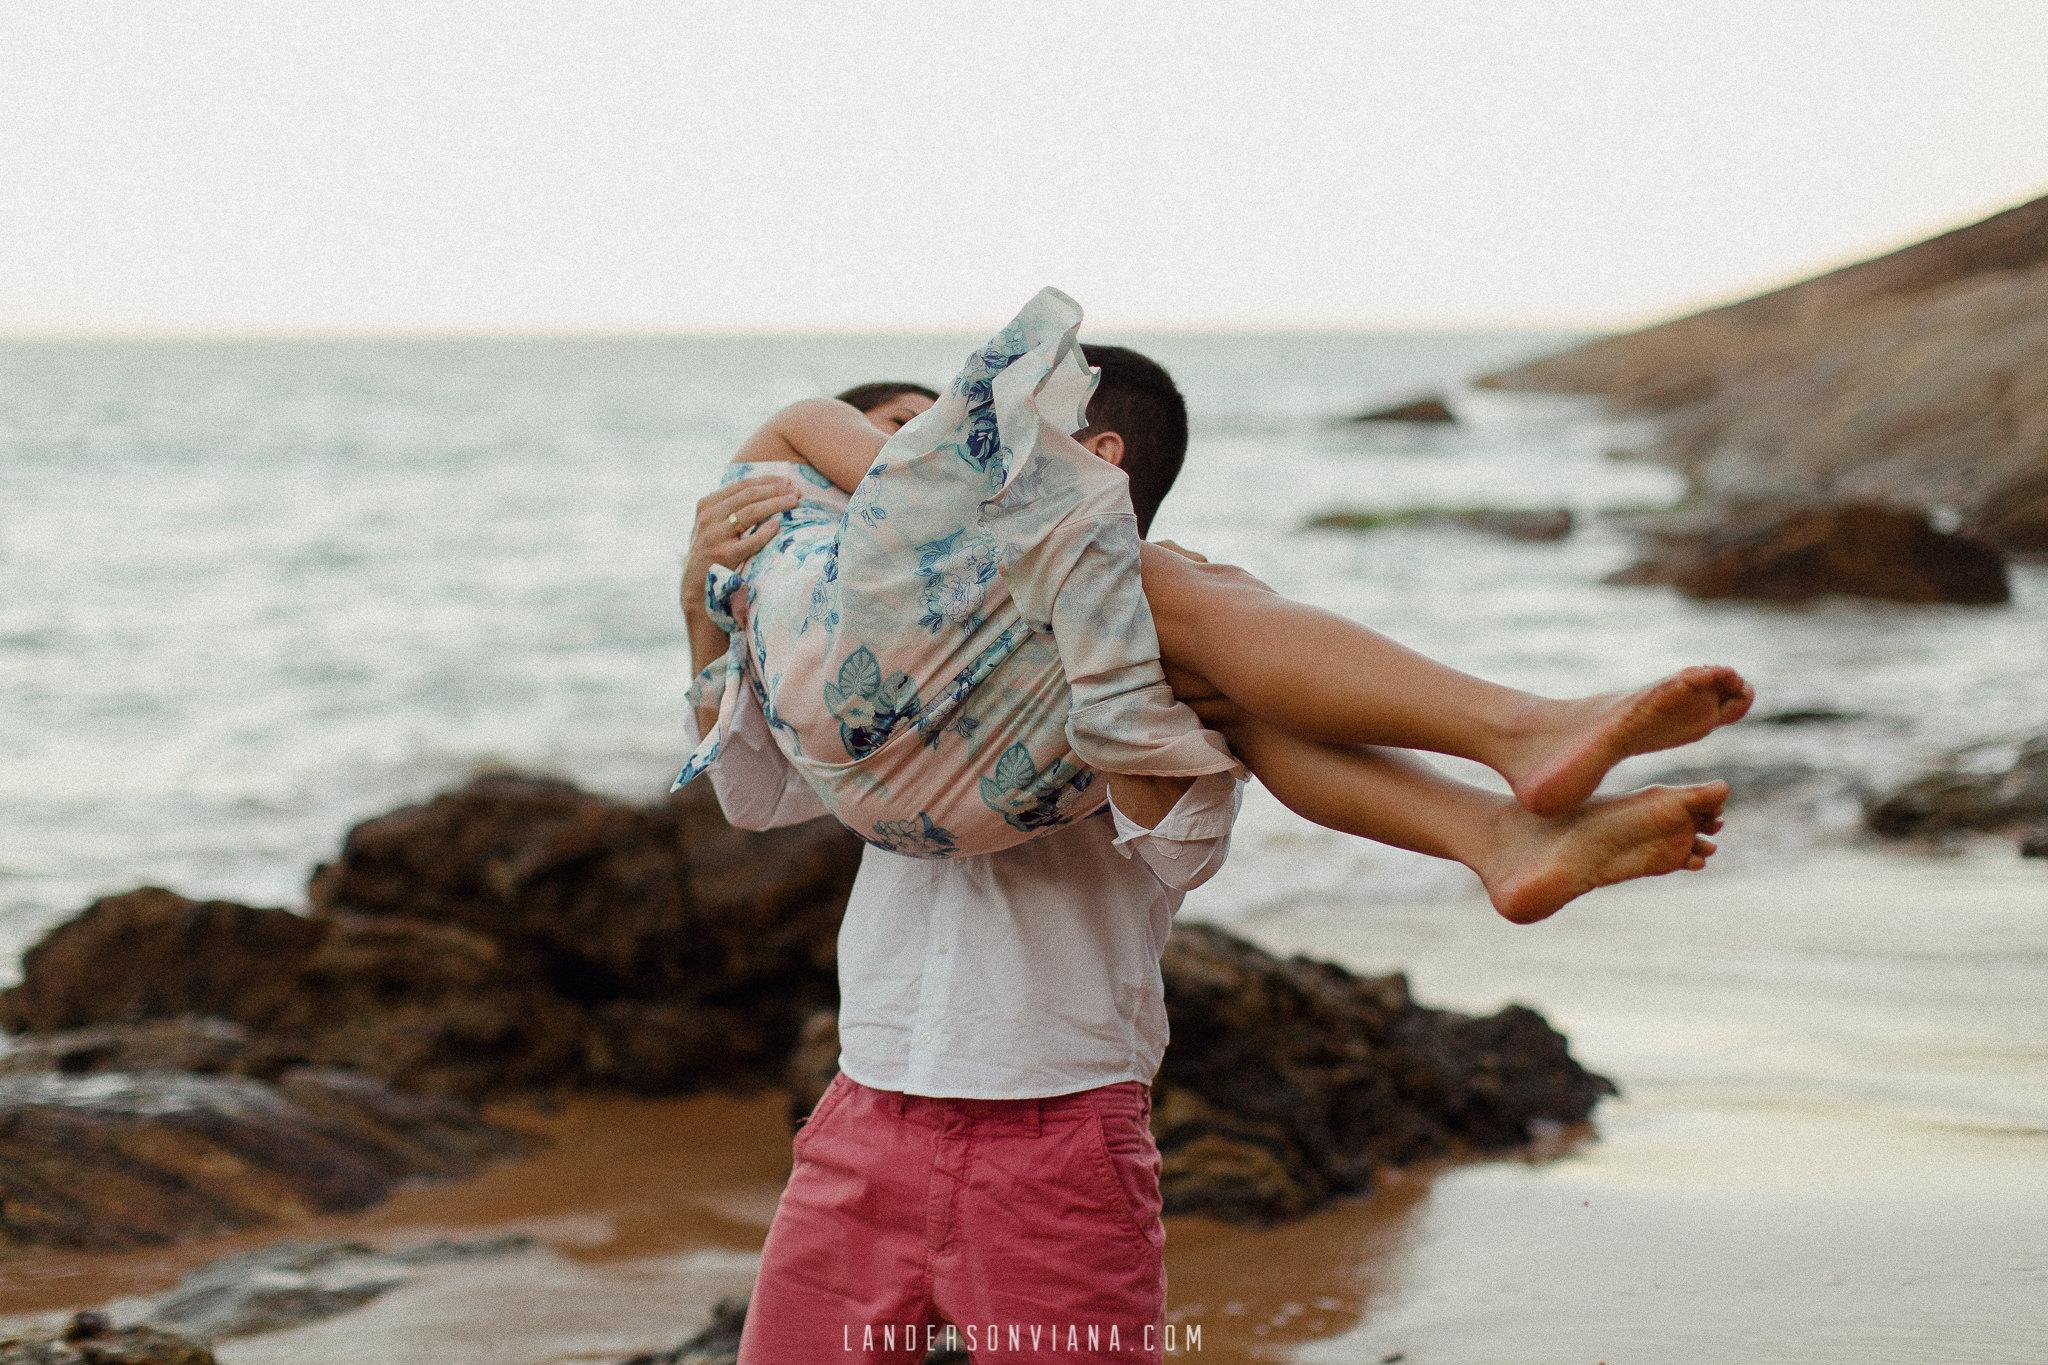 ensaio-pre-wedding-praia-landerson-viana-fotografia-casamento-pegueiobouquet-18.jpg